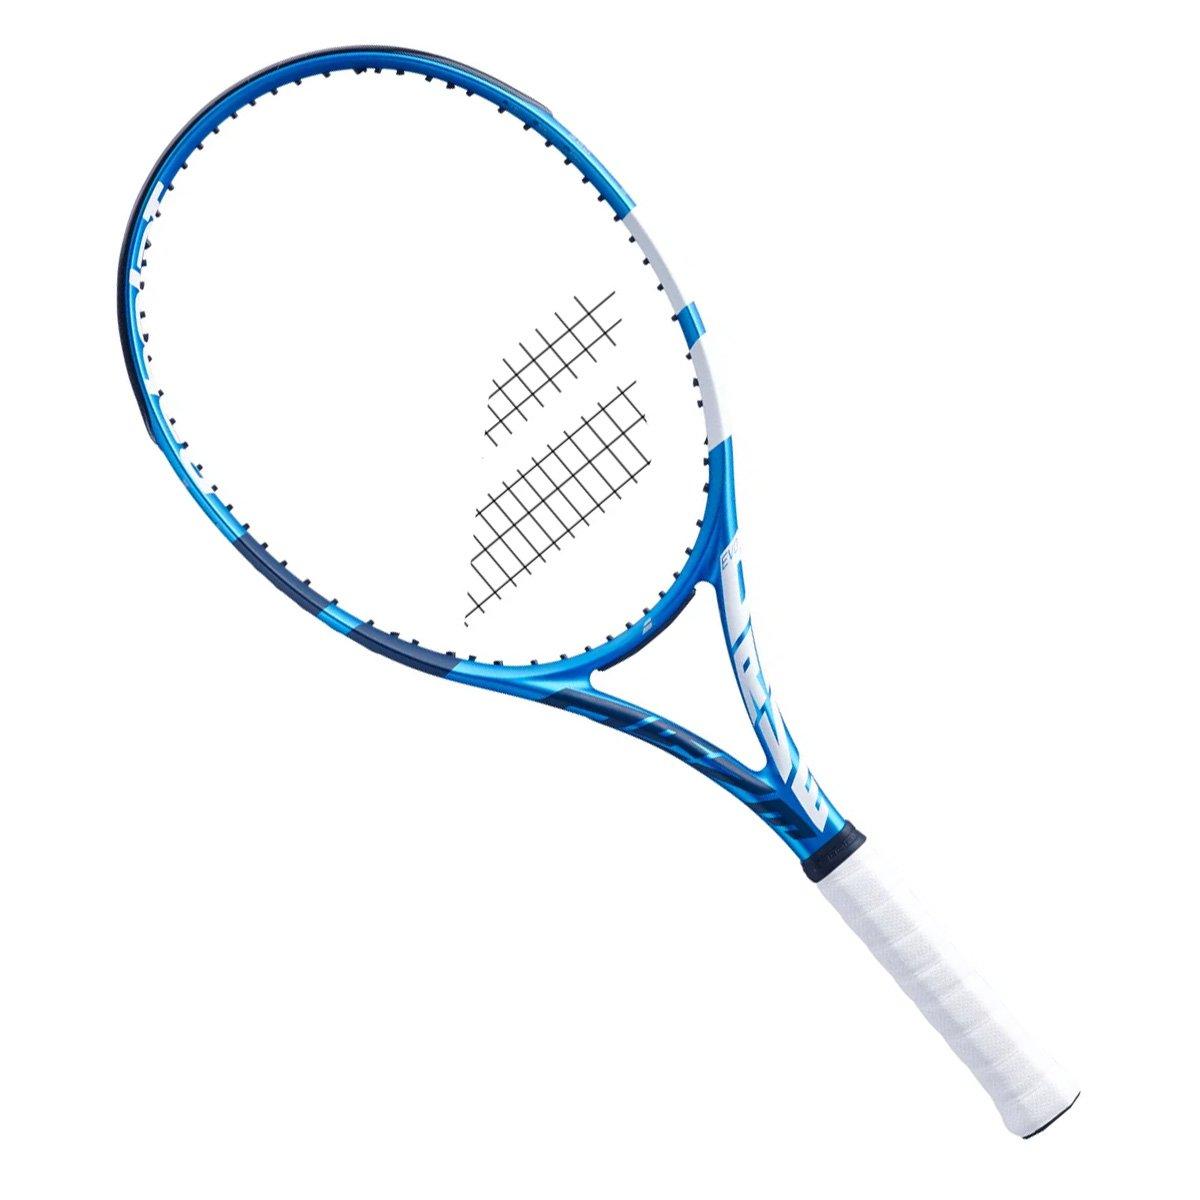 Raquete de Tênis Babolat Evo Drive Azul L1